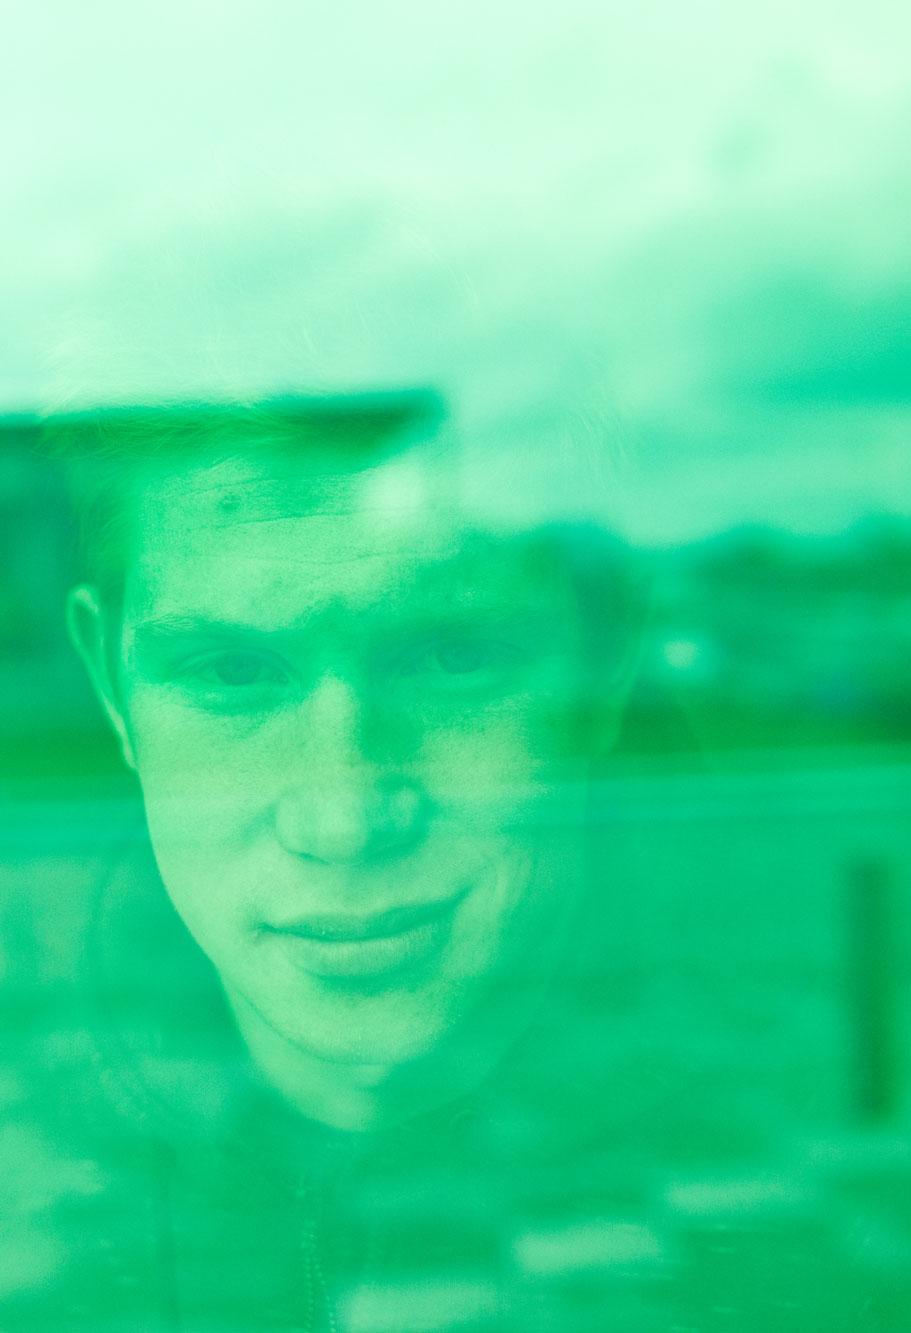 Kevin de Bruyne, 2015 Portrait Patrick Desbrosses